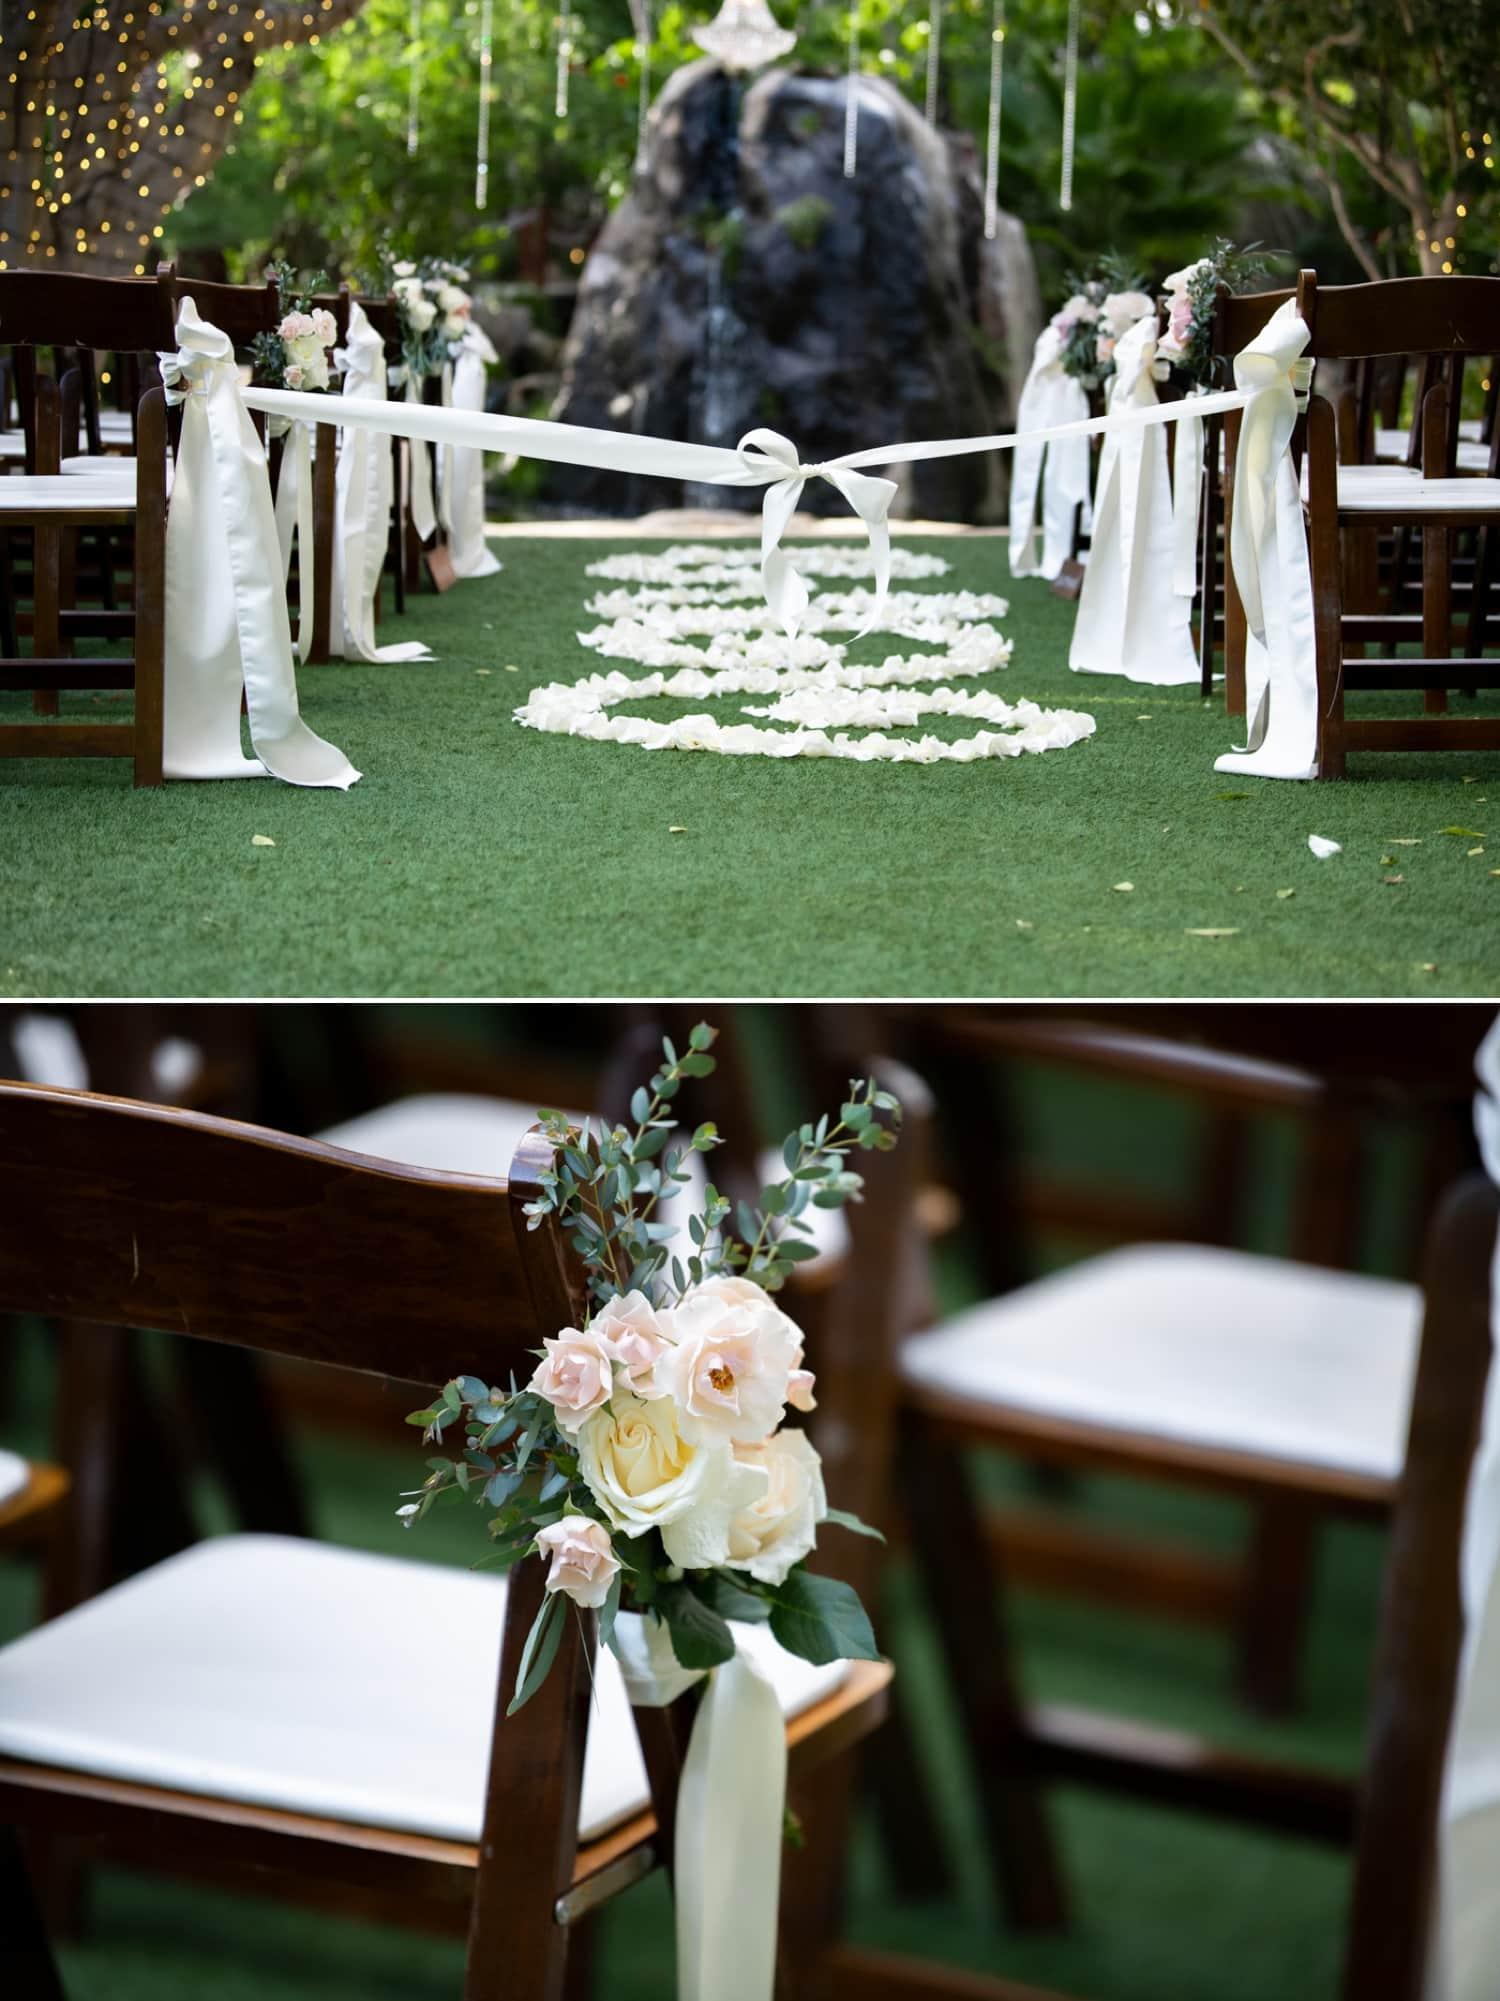 Wedding ceremony site at Botanica wedding venue in Oceanside, CA.